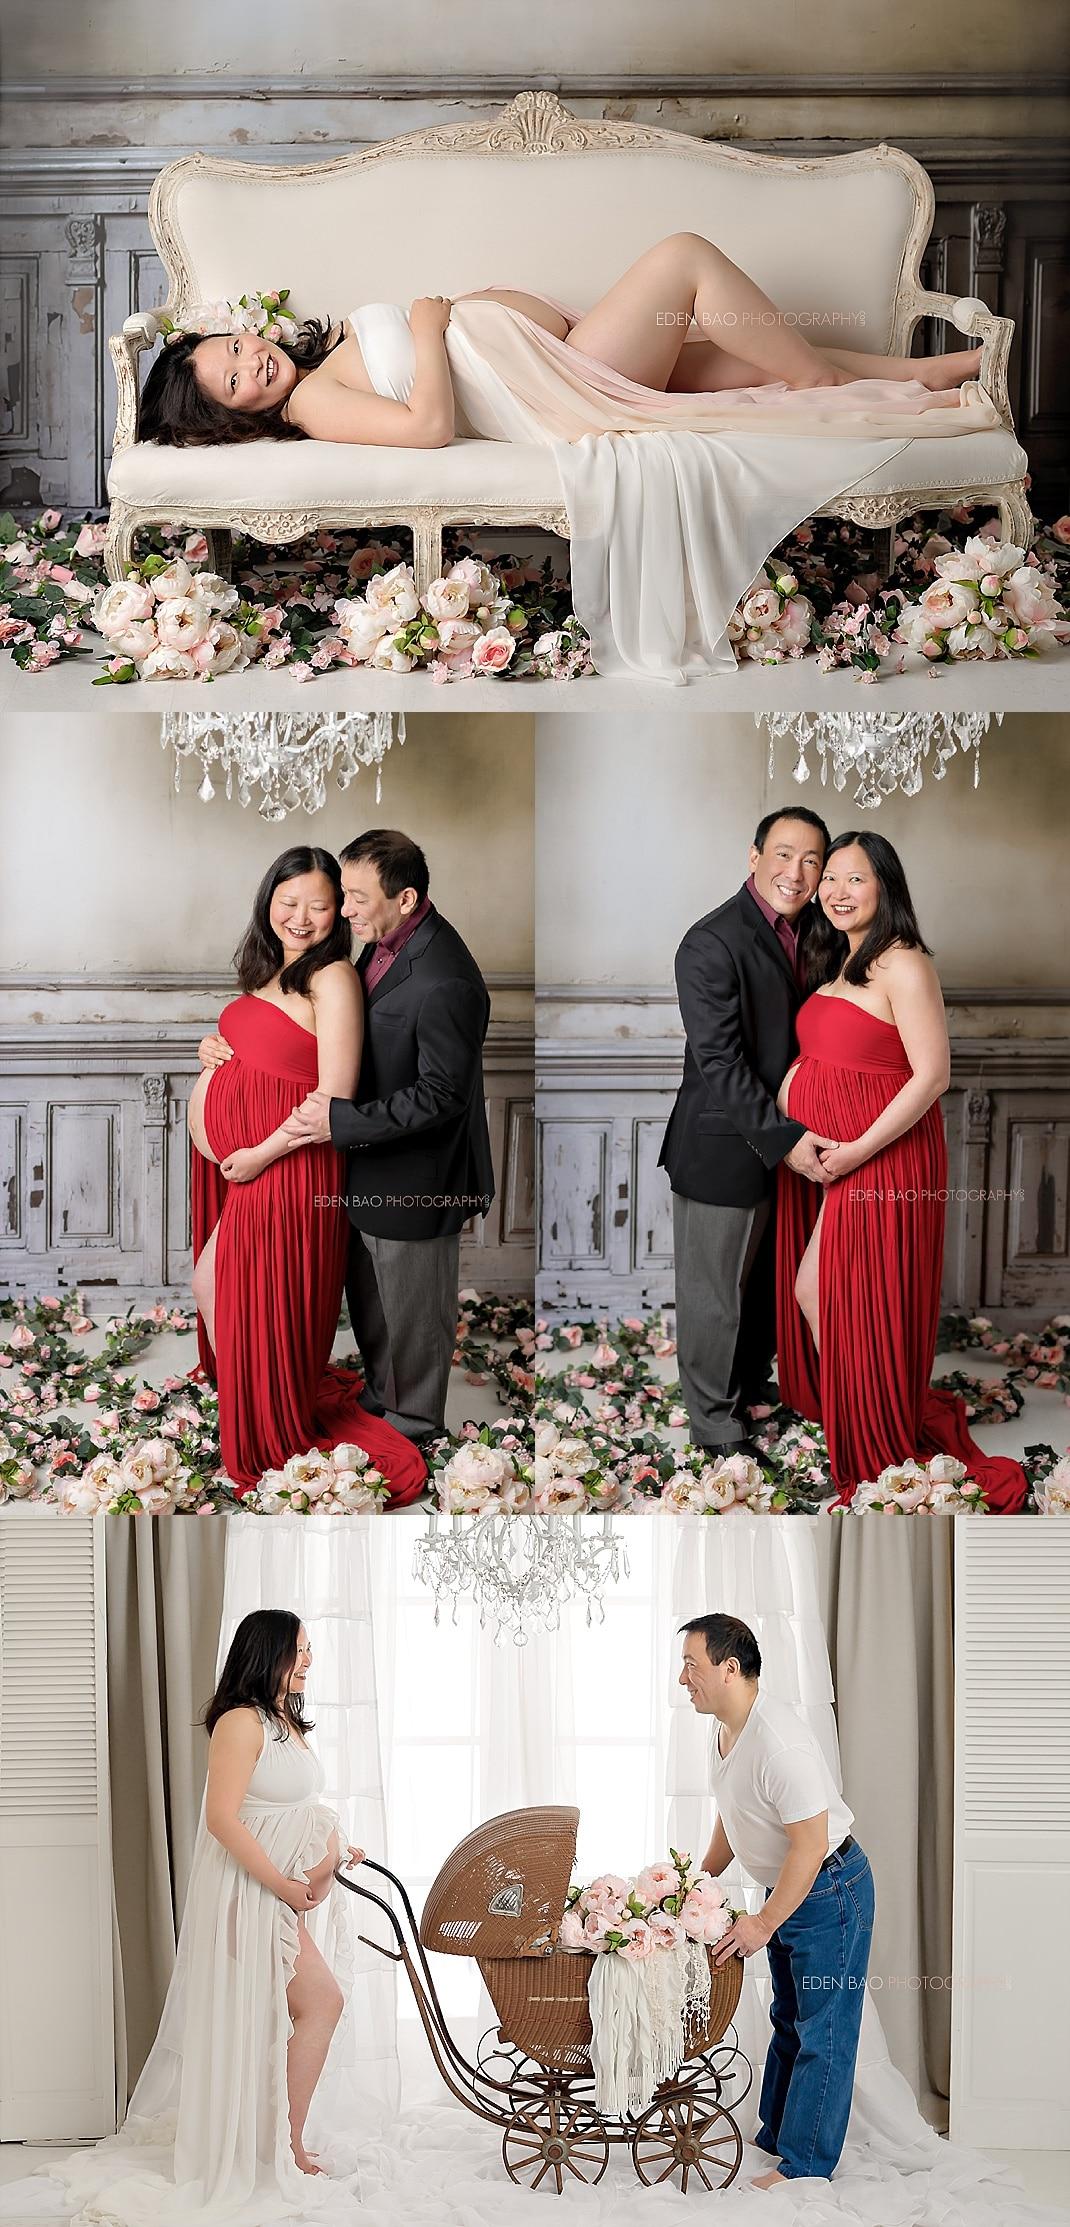 renton-maternity-photographer-pregnant-mom-on-vintage-chair